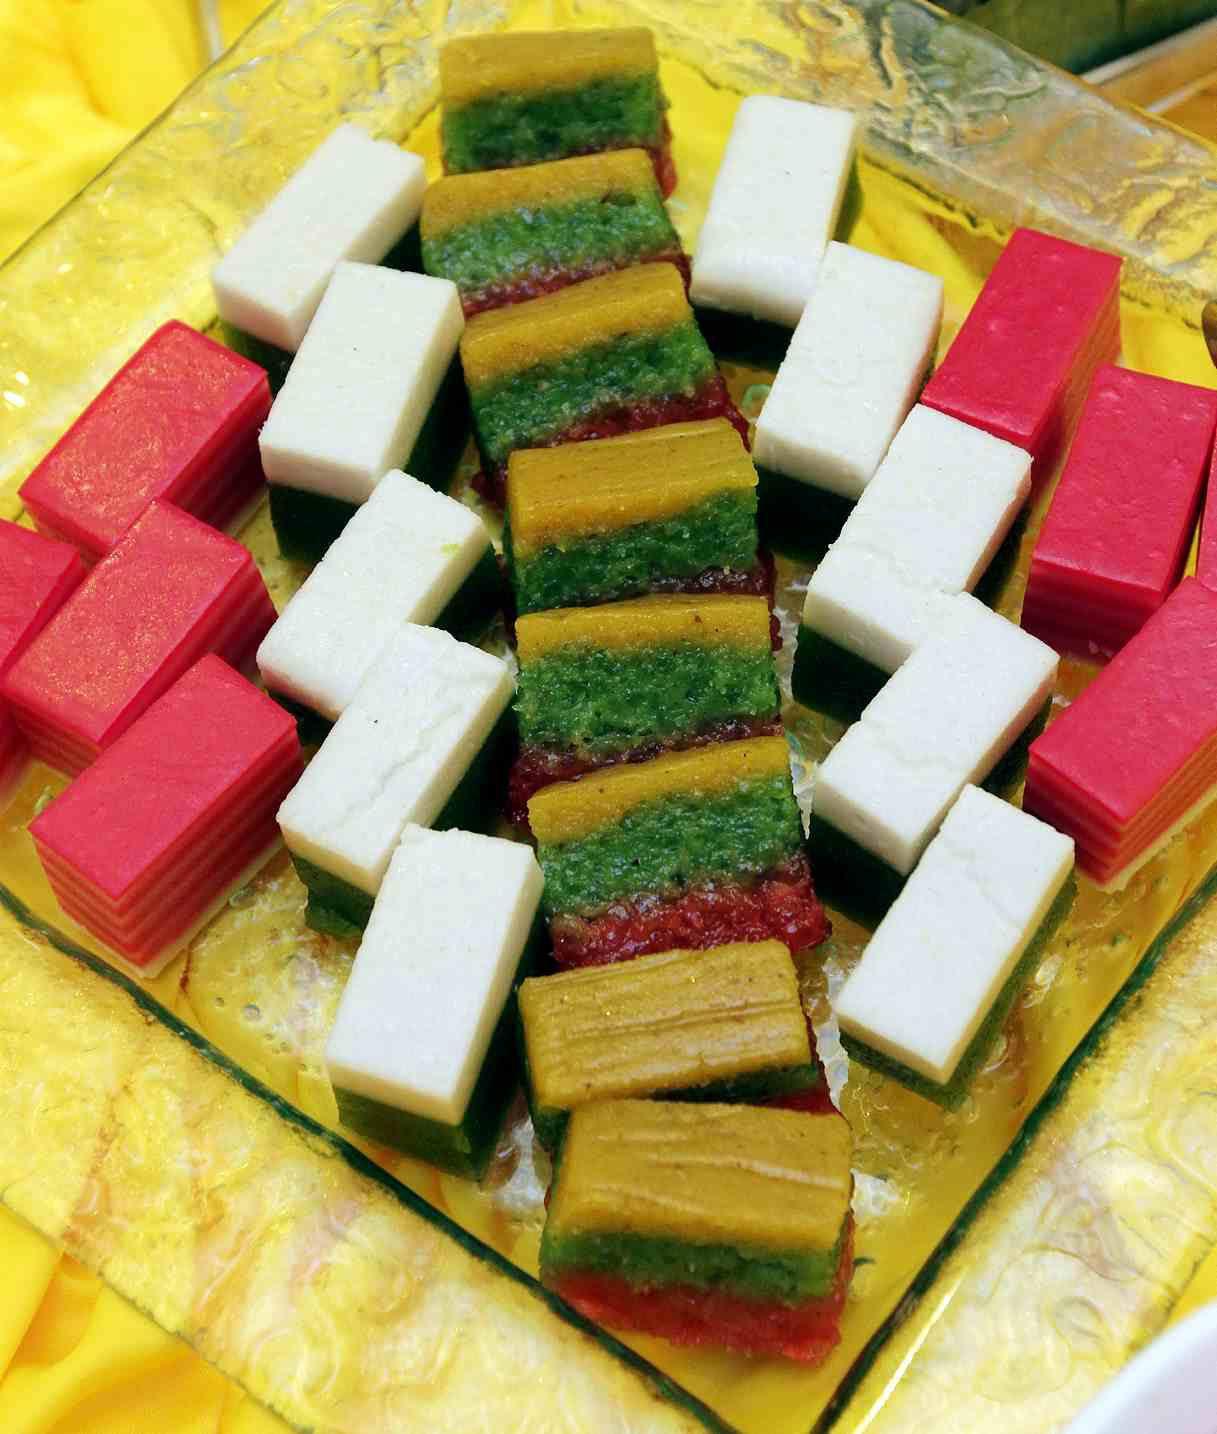 kuih malay traditional assorted ramadan curvz homemade food kuali